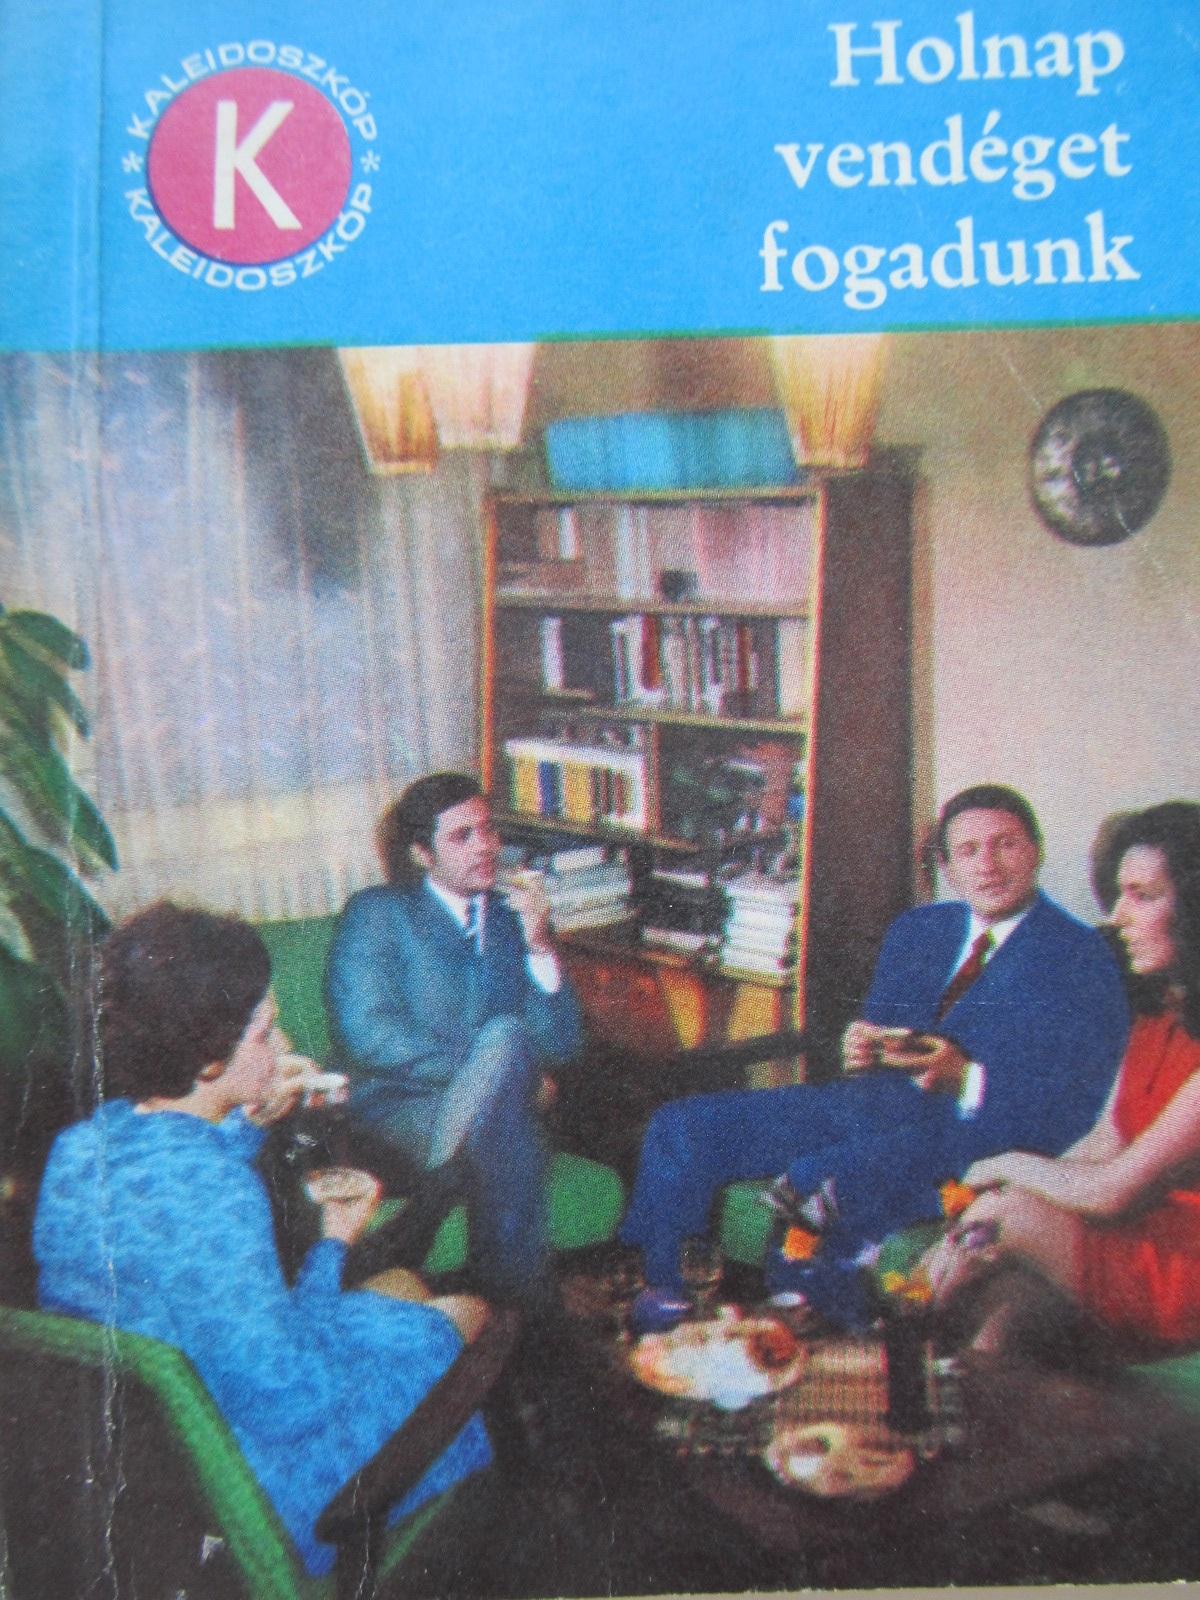 Holnap vendeget fogadunk (5) - Smaranda Sburlan | Detalii carte